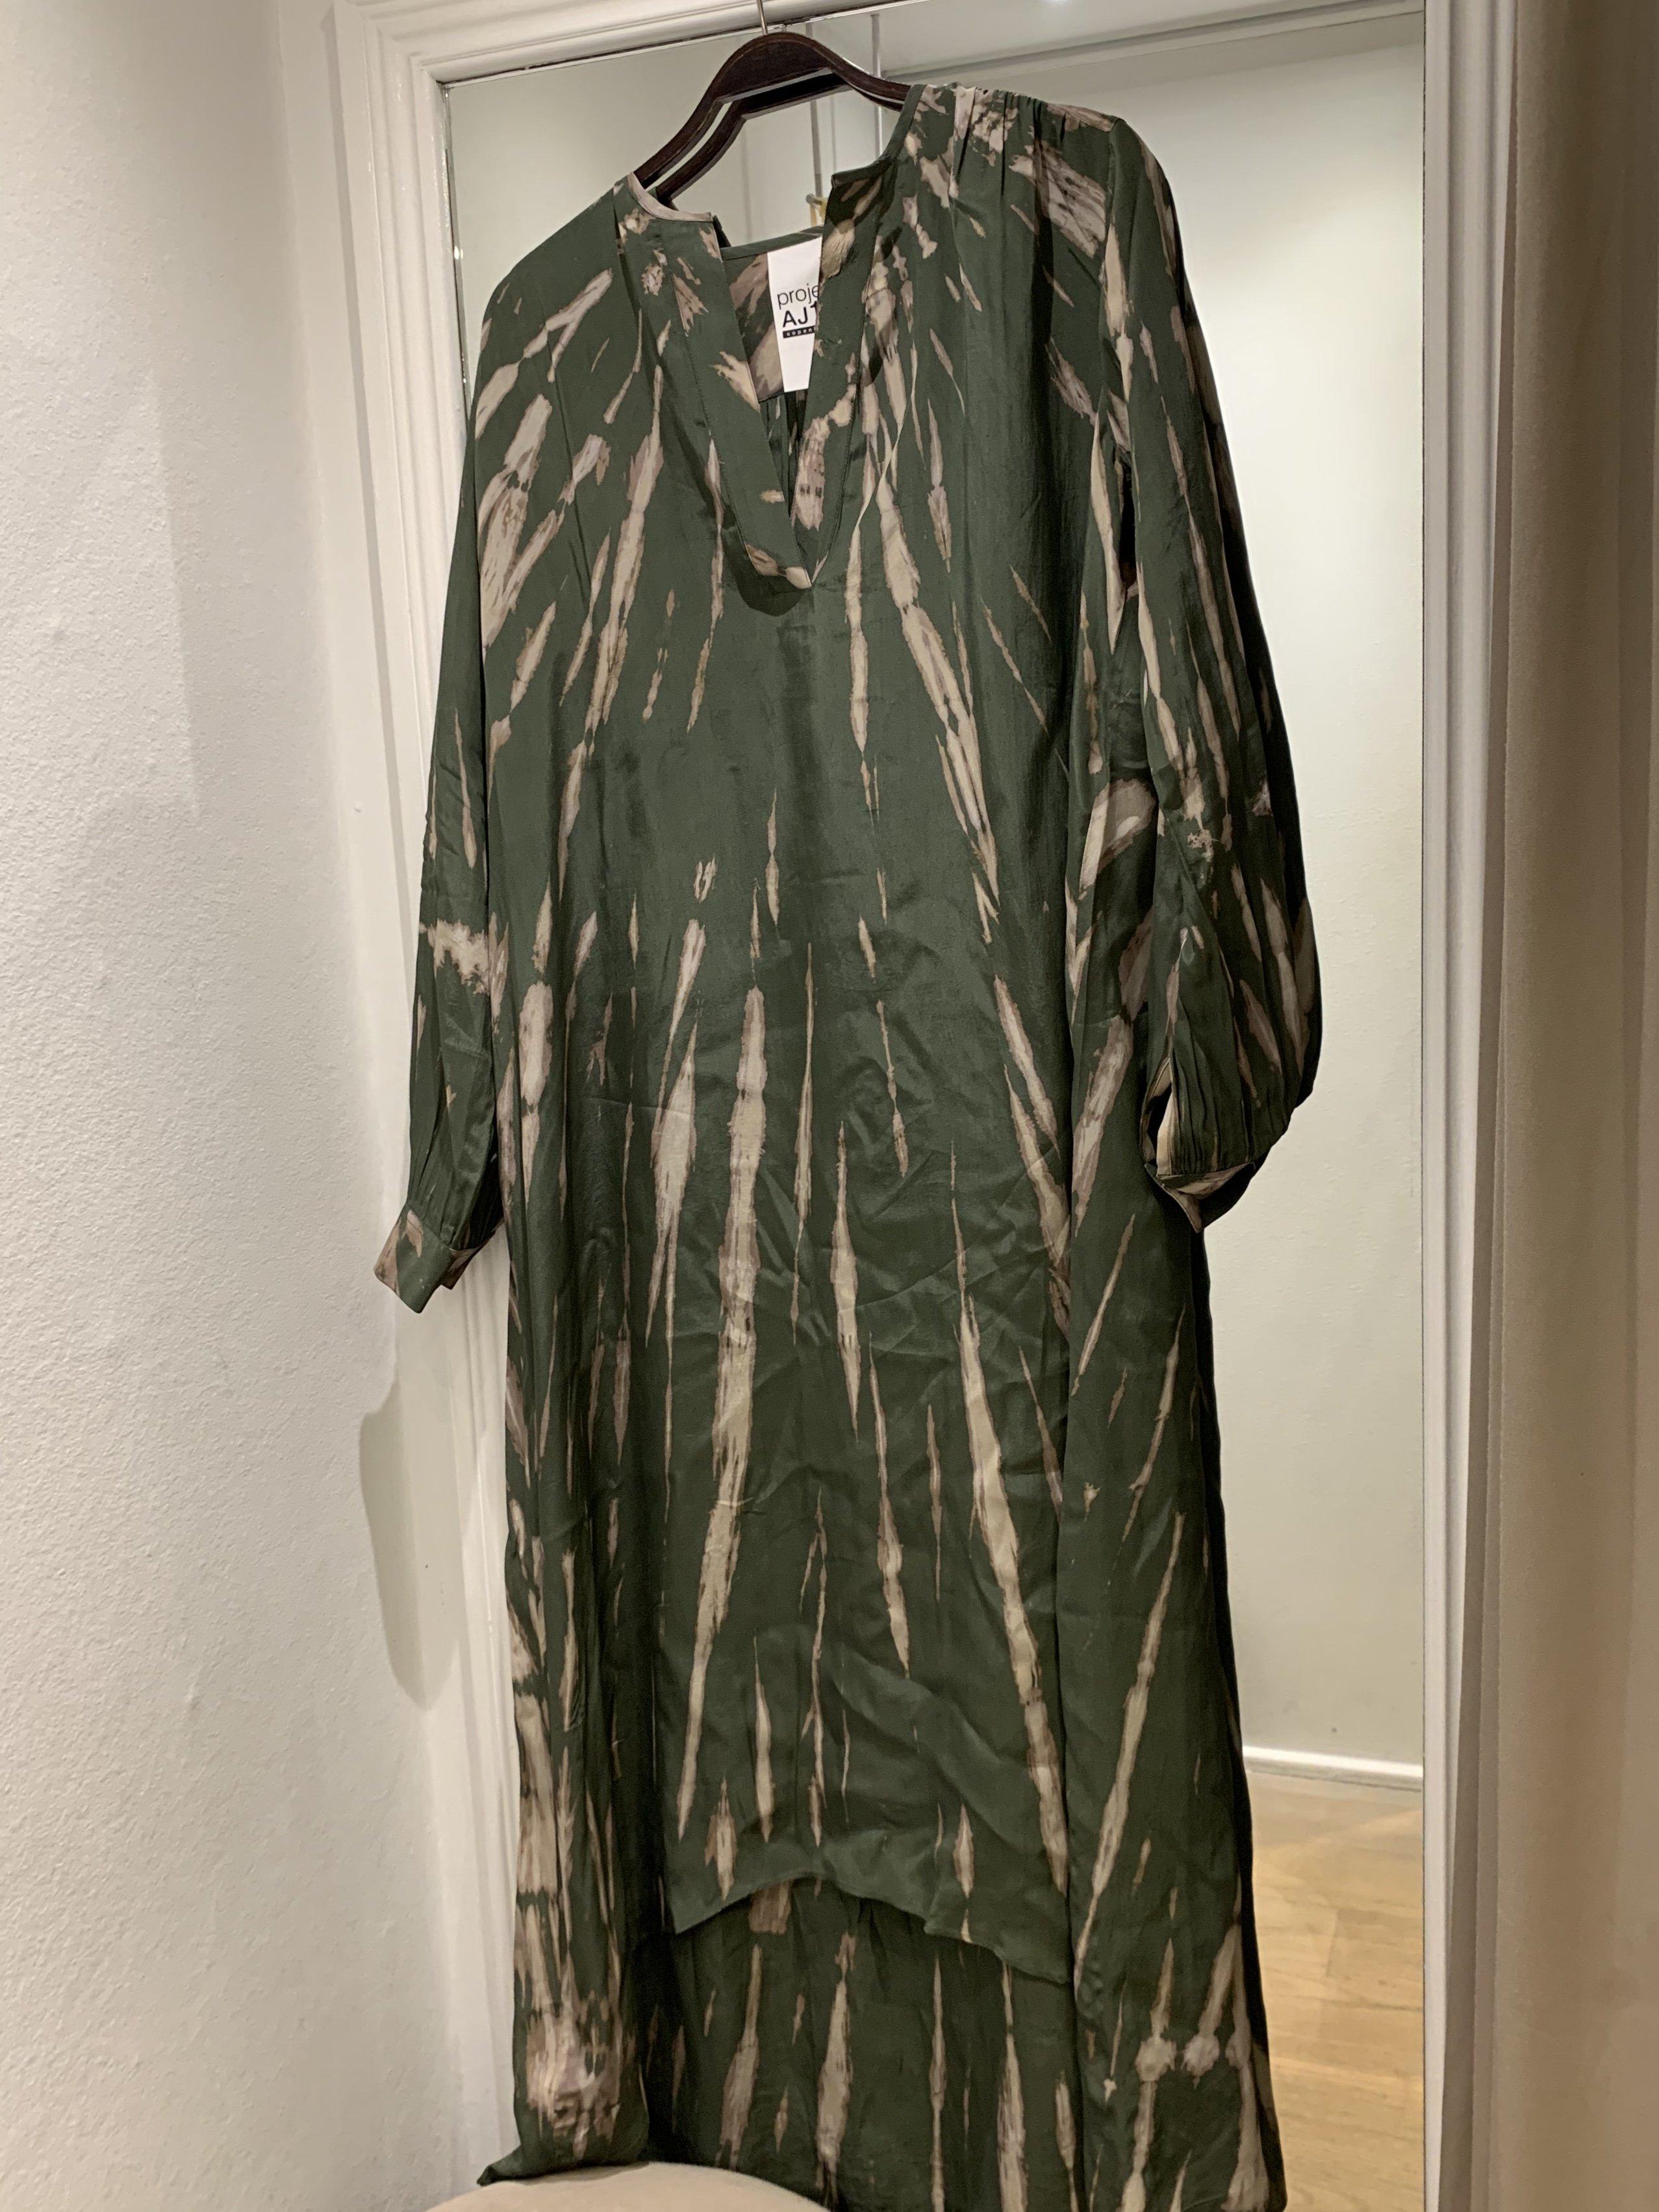 AJ 117 Project Faitheen Dress - 992 Khaki Jungle